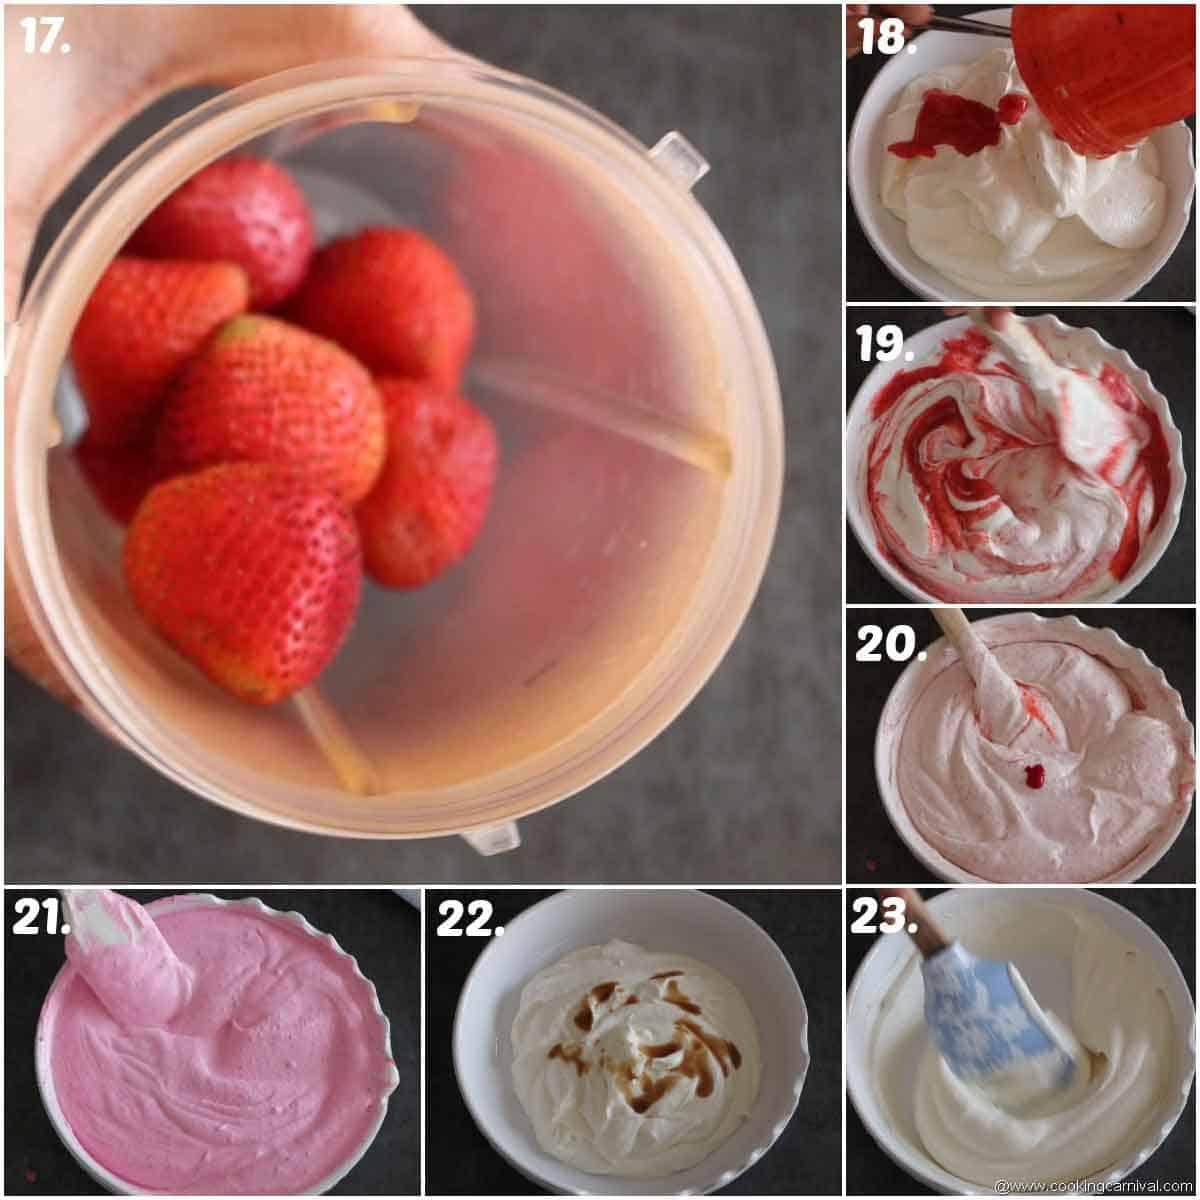 vanilla ice cream and strawberry ice cream in making